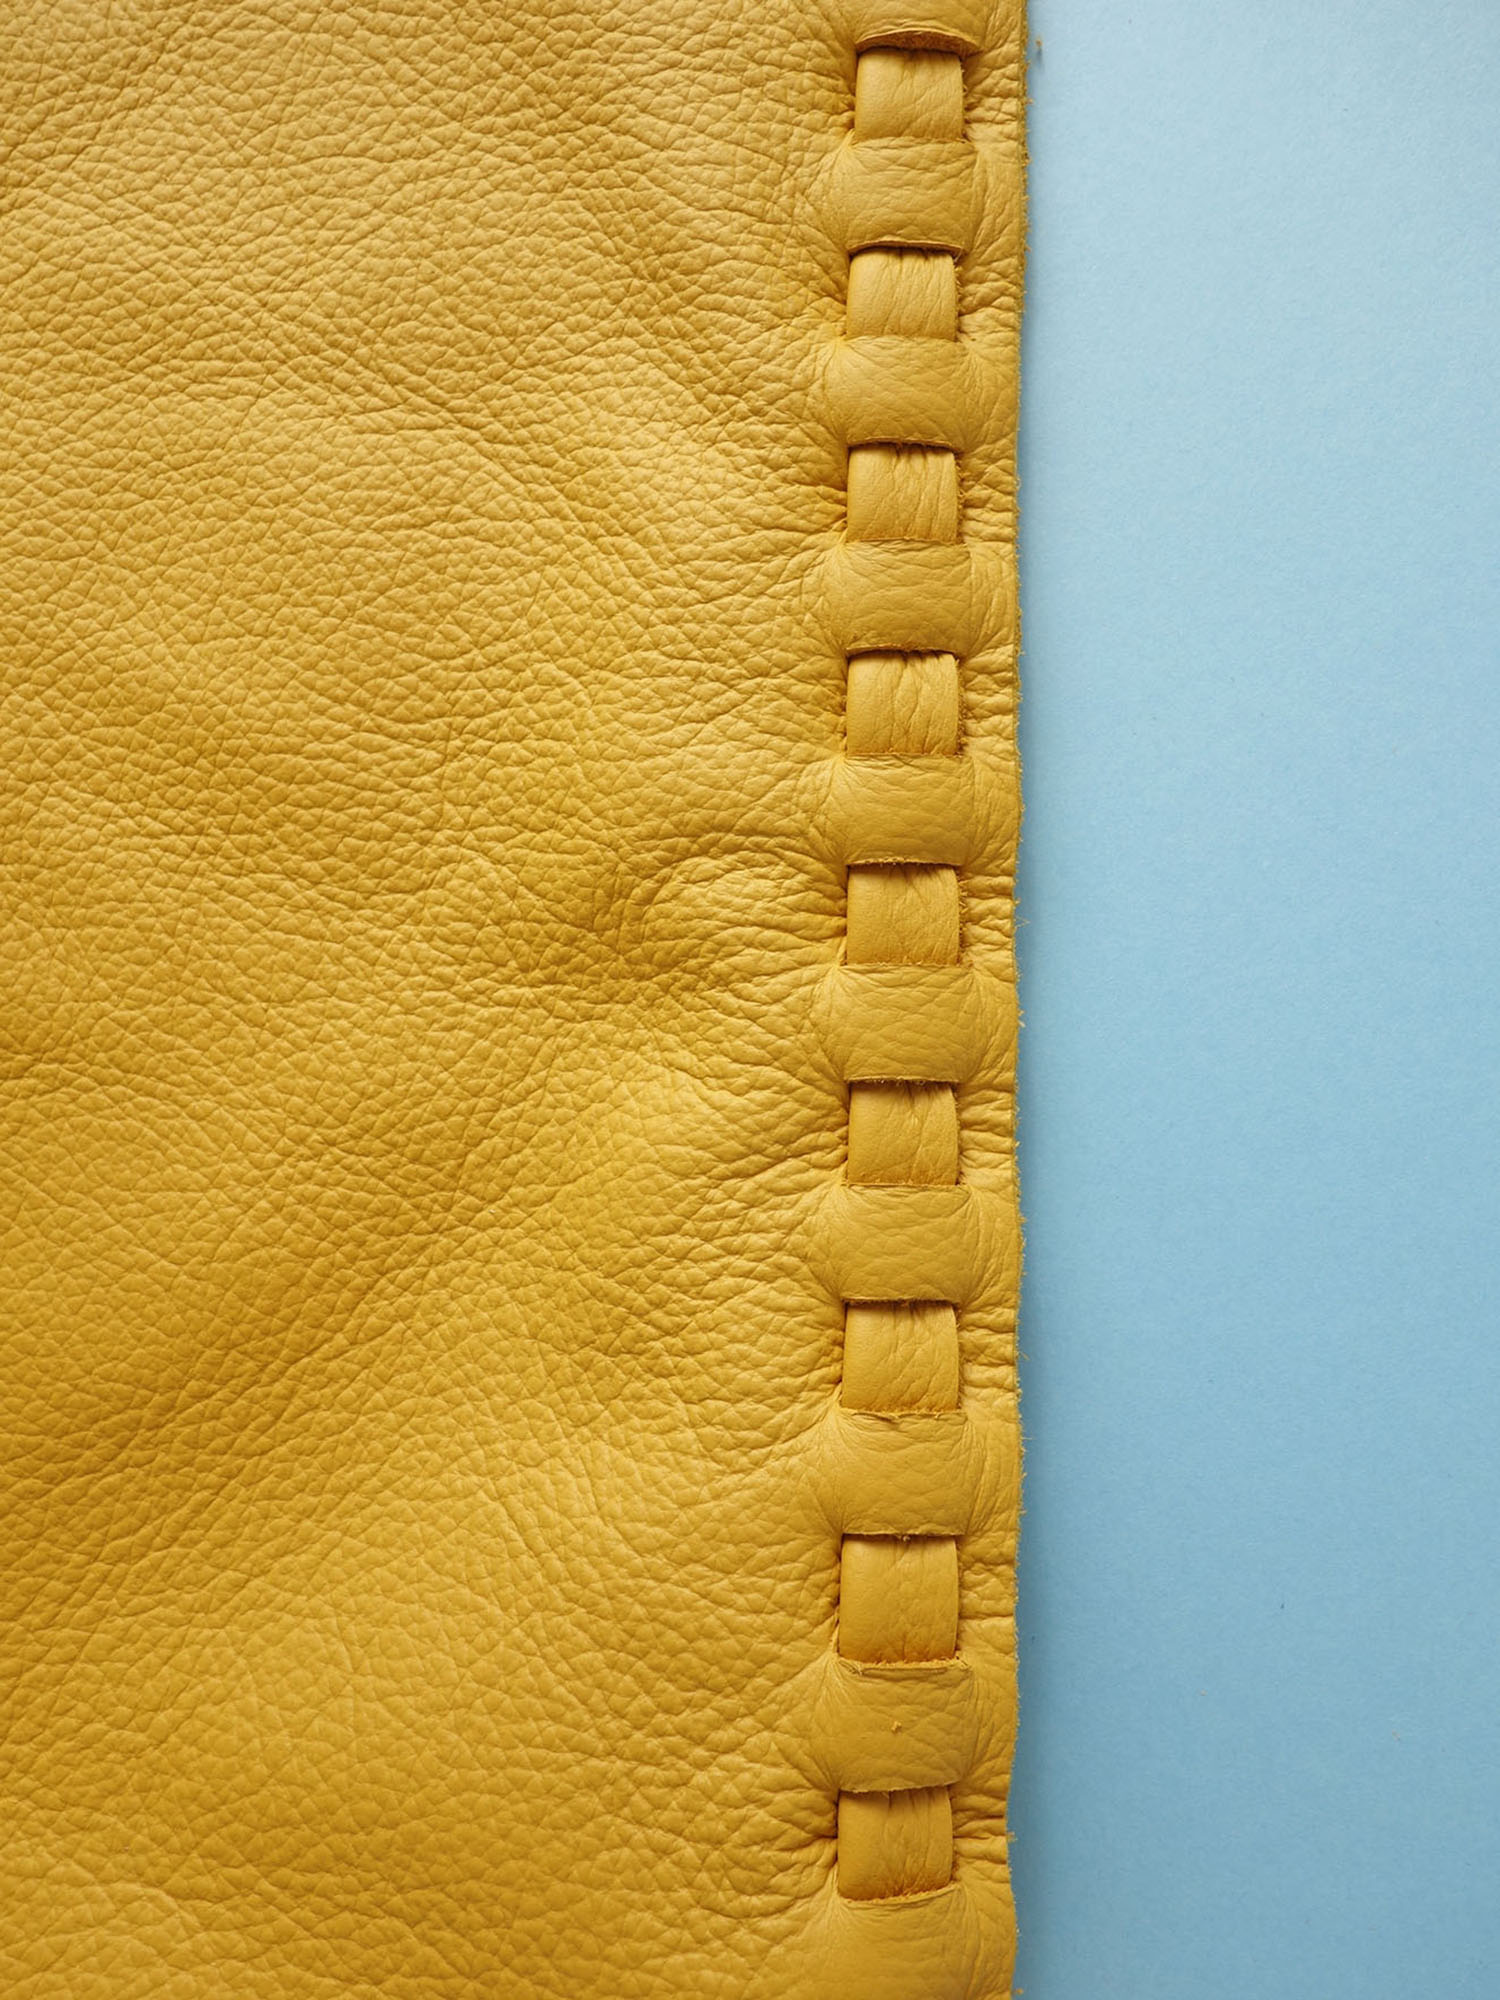 Liodebruin_Leather_Drawstringbags_01.jpg